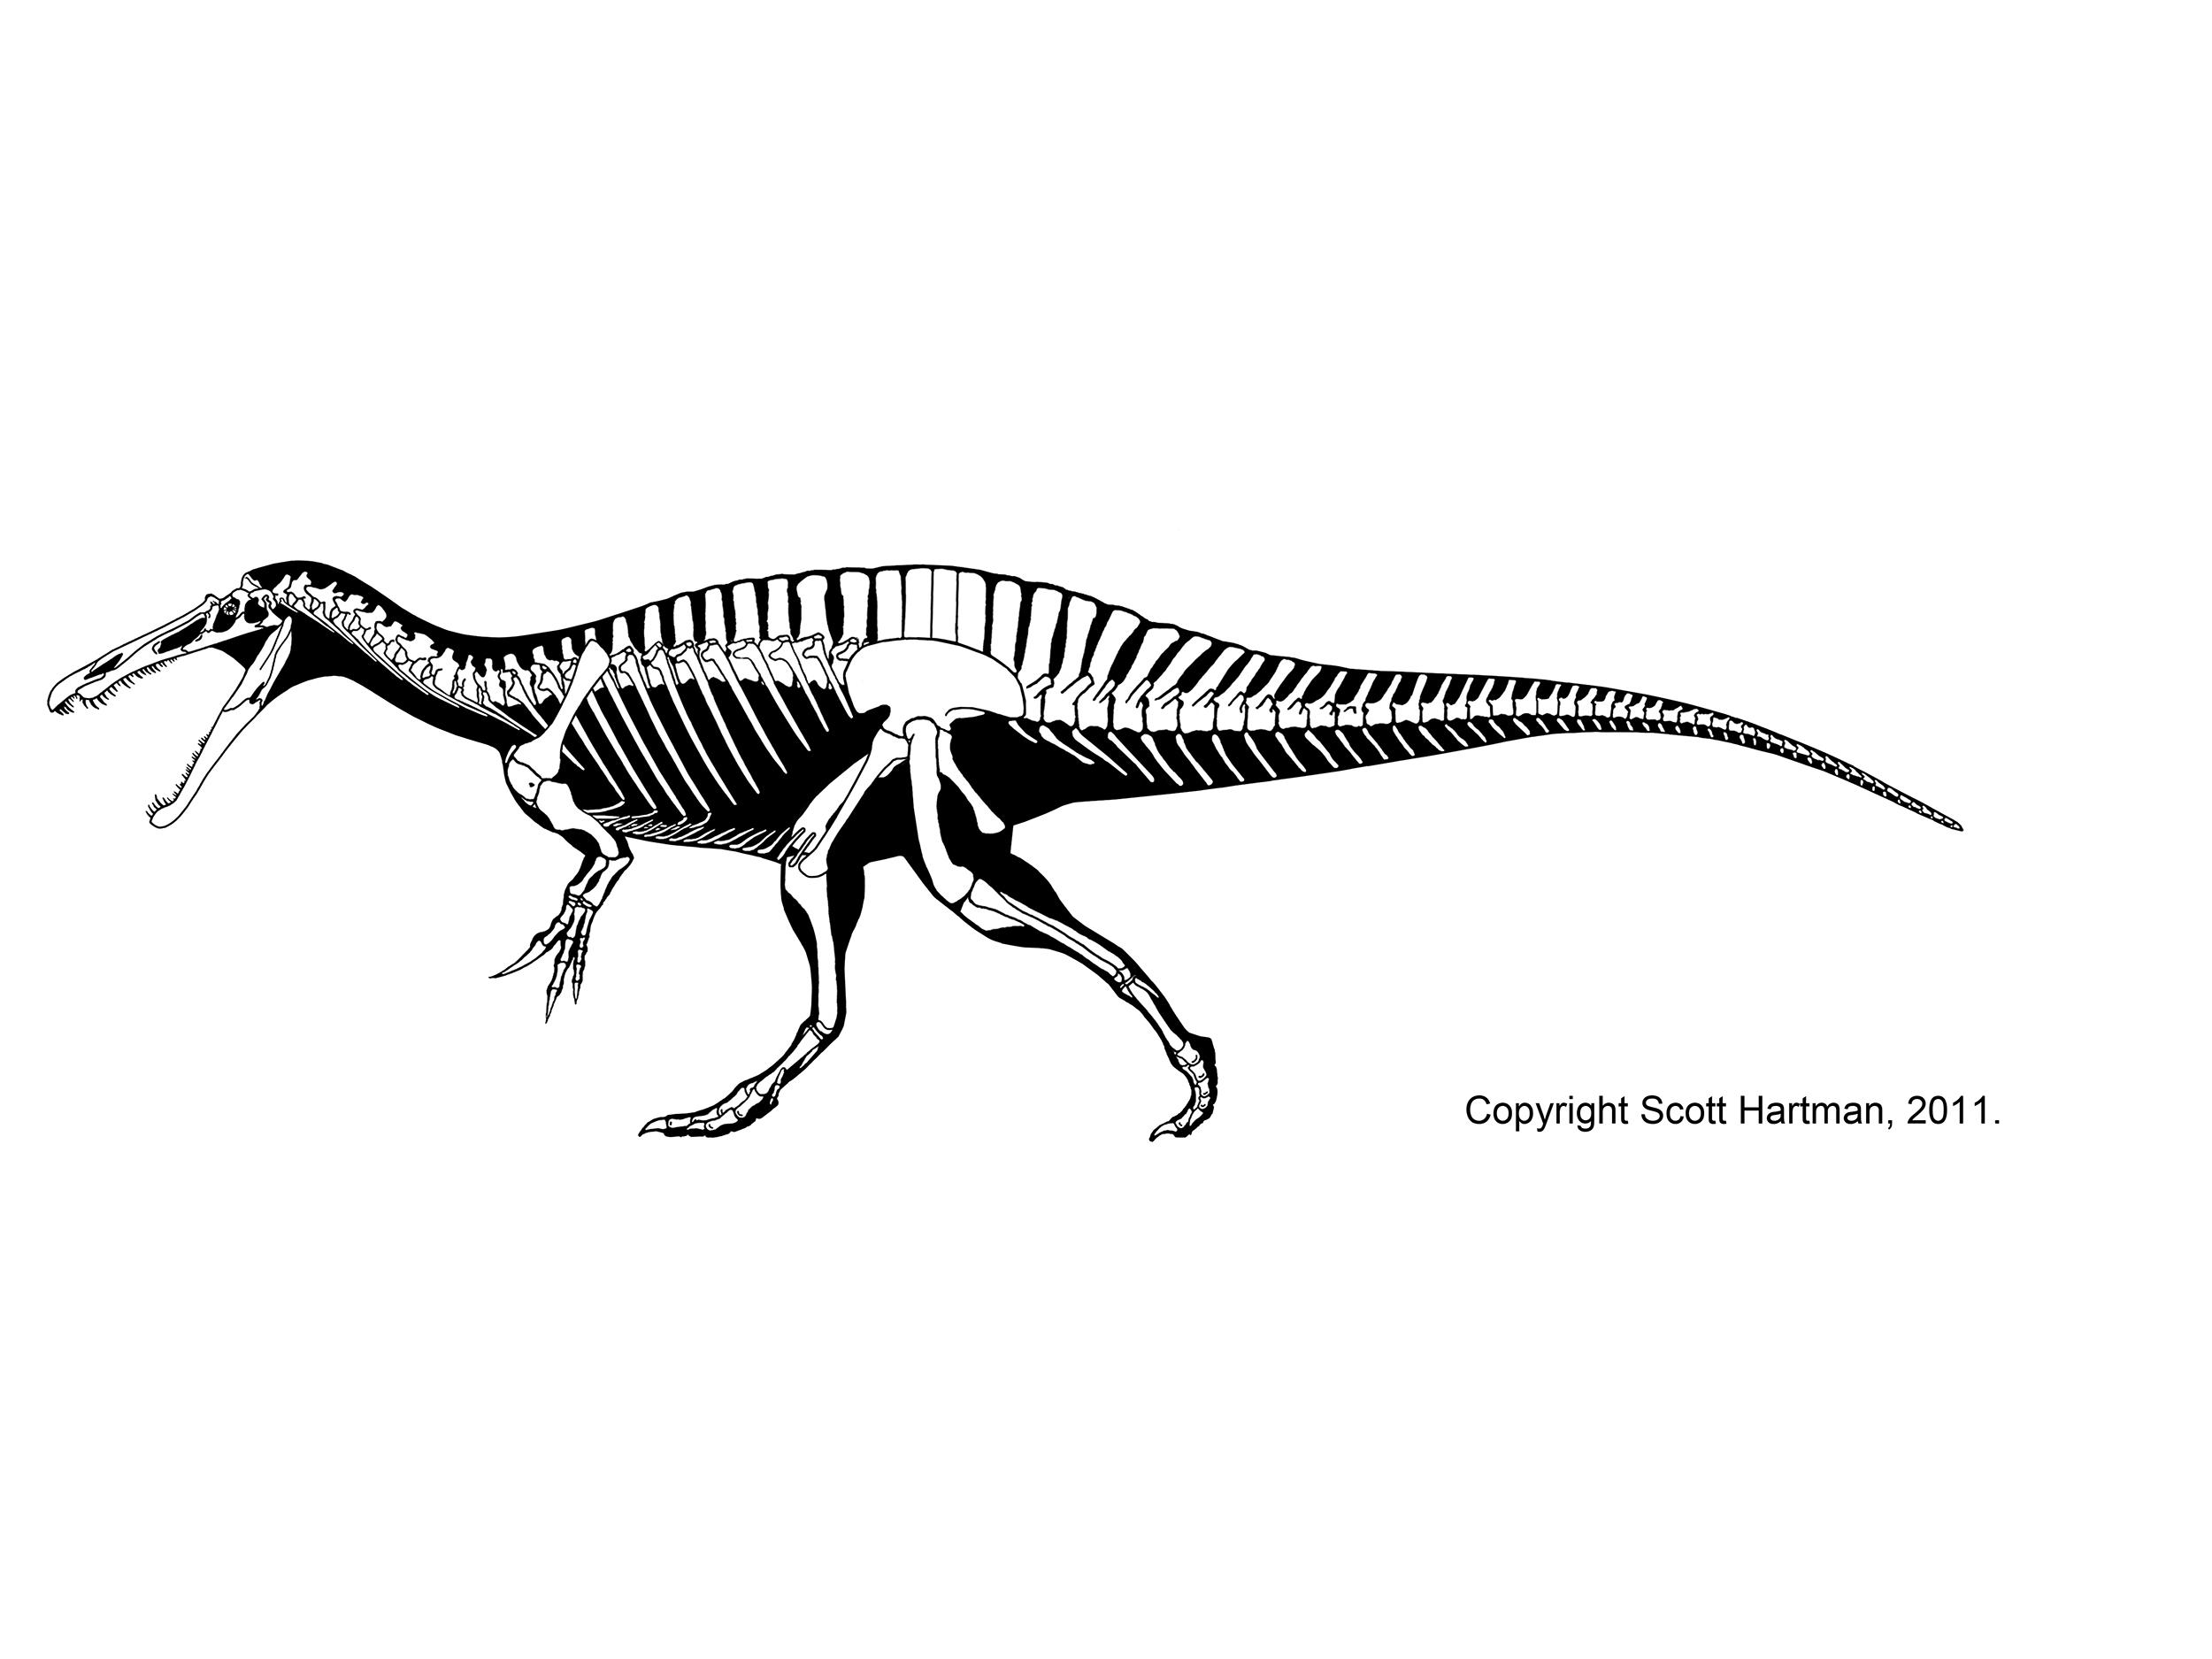 Suchomimus tenerensis